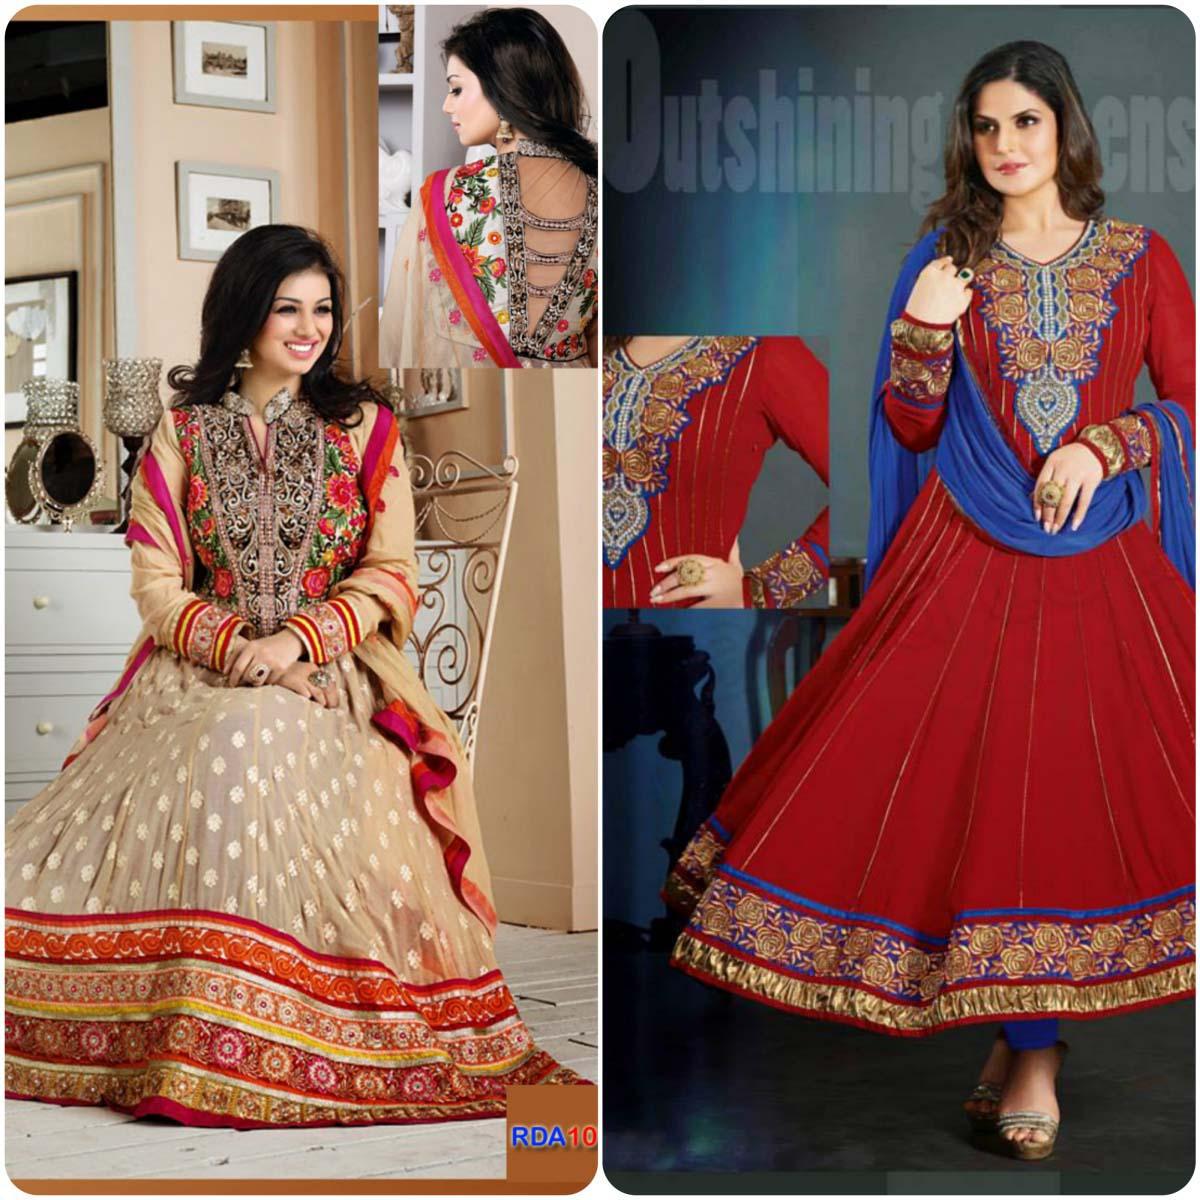 Natasha Couture Latest Indian Anarkali Dress Desigs Collection 2016-2017...styloplanet (5)